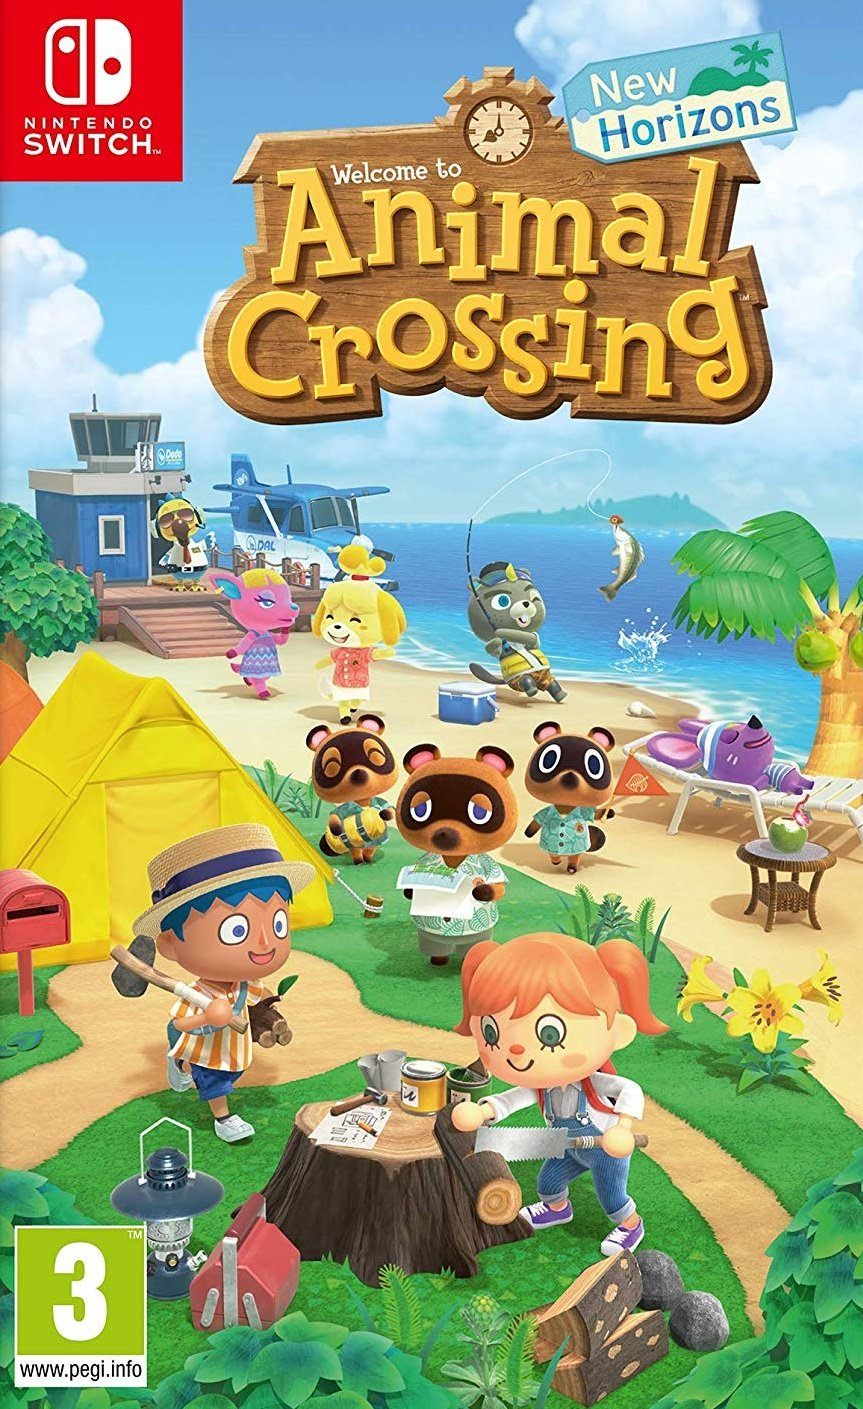 jaquette du jeu vidéo Animal Crossing: New Horizons